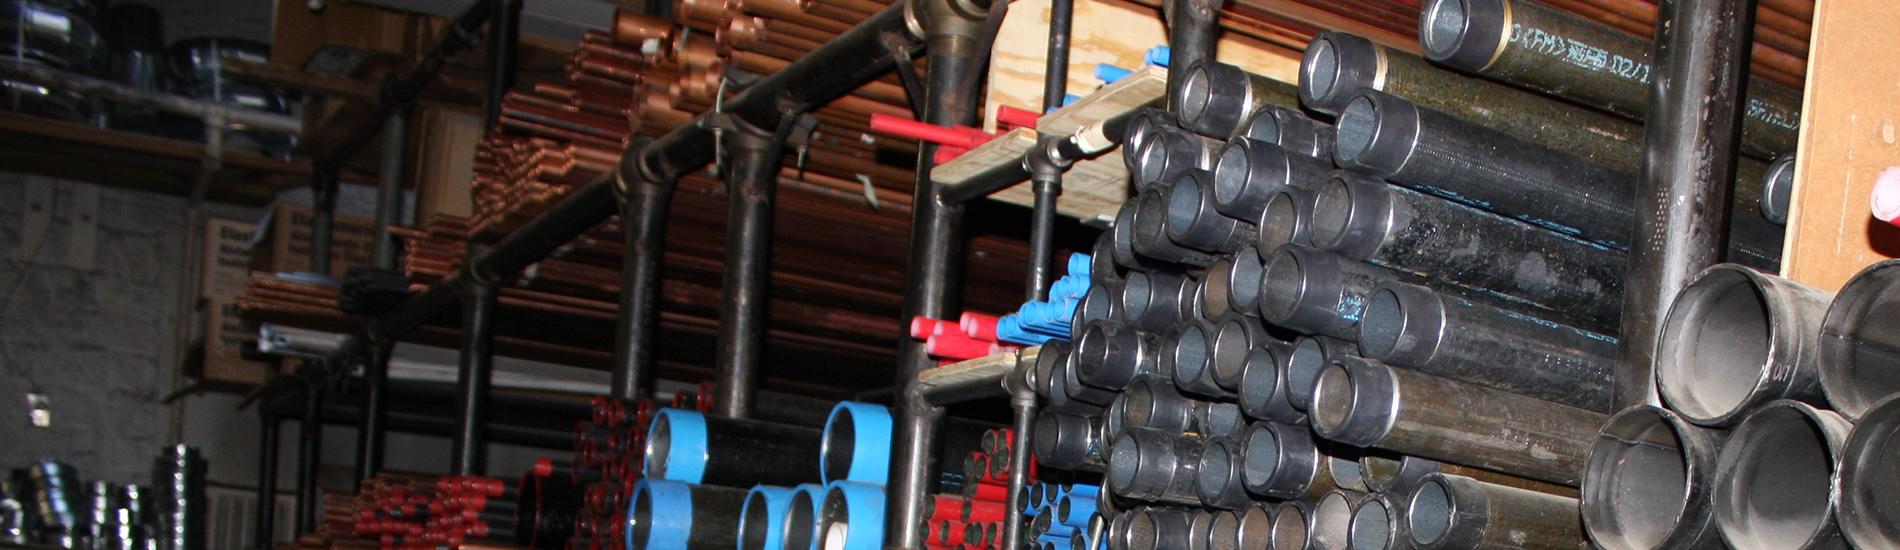 Jasco Plumbing & Heating Supplies